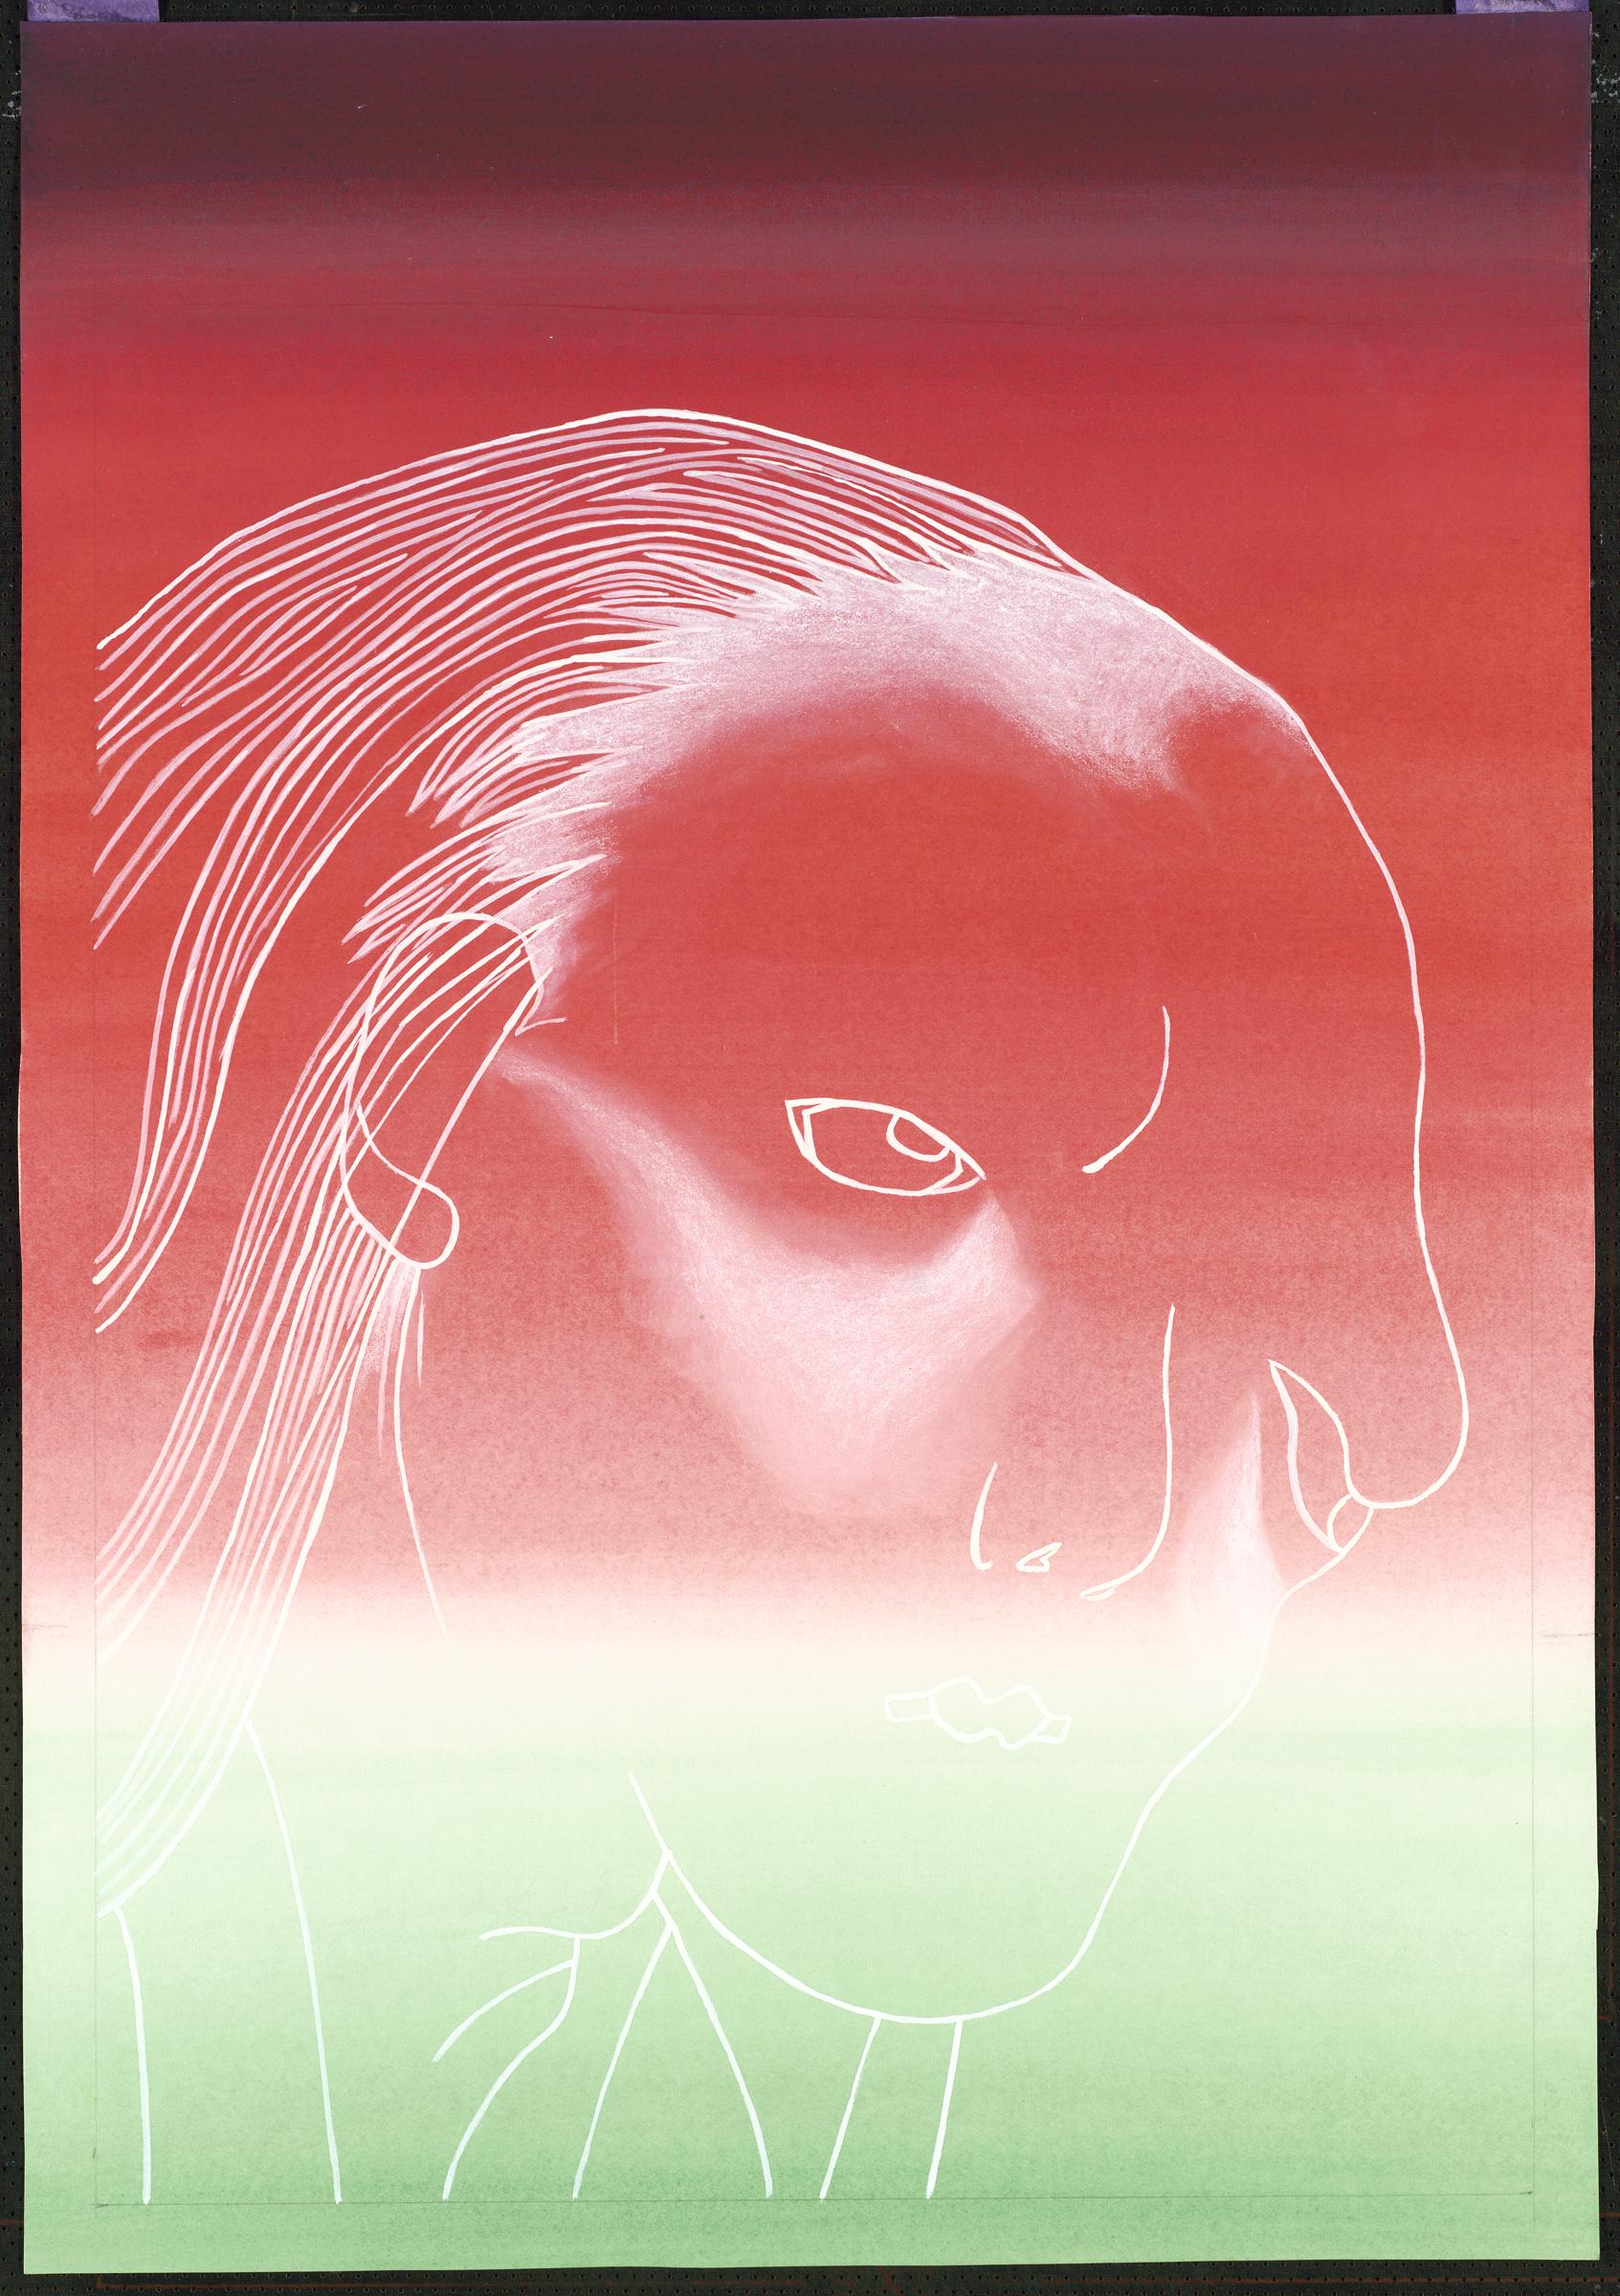 Ghosts and Demons: Oiwa, 1989